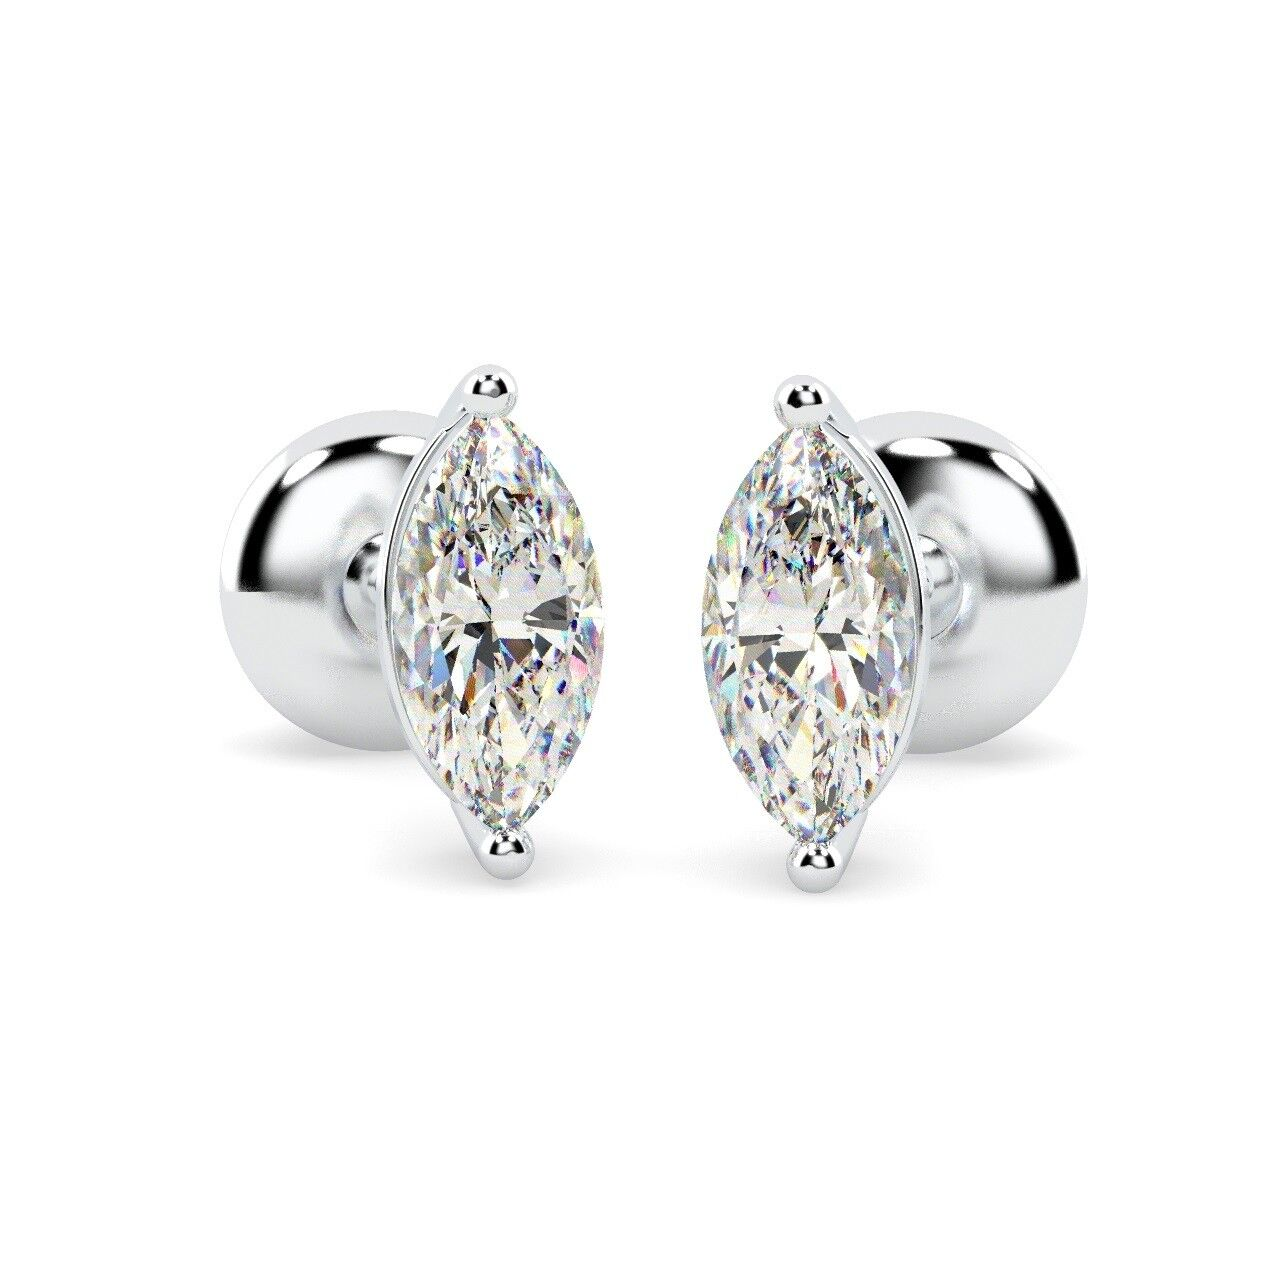 00d0eff79bd51 F VS 0.40ct Marquise Diamond Stud Earring in 18k White gold ...